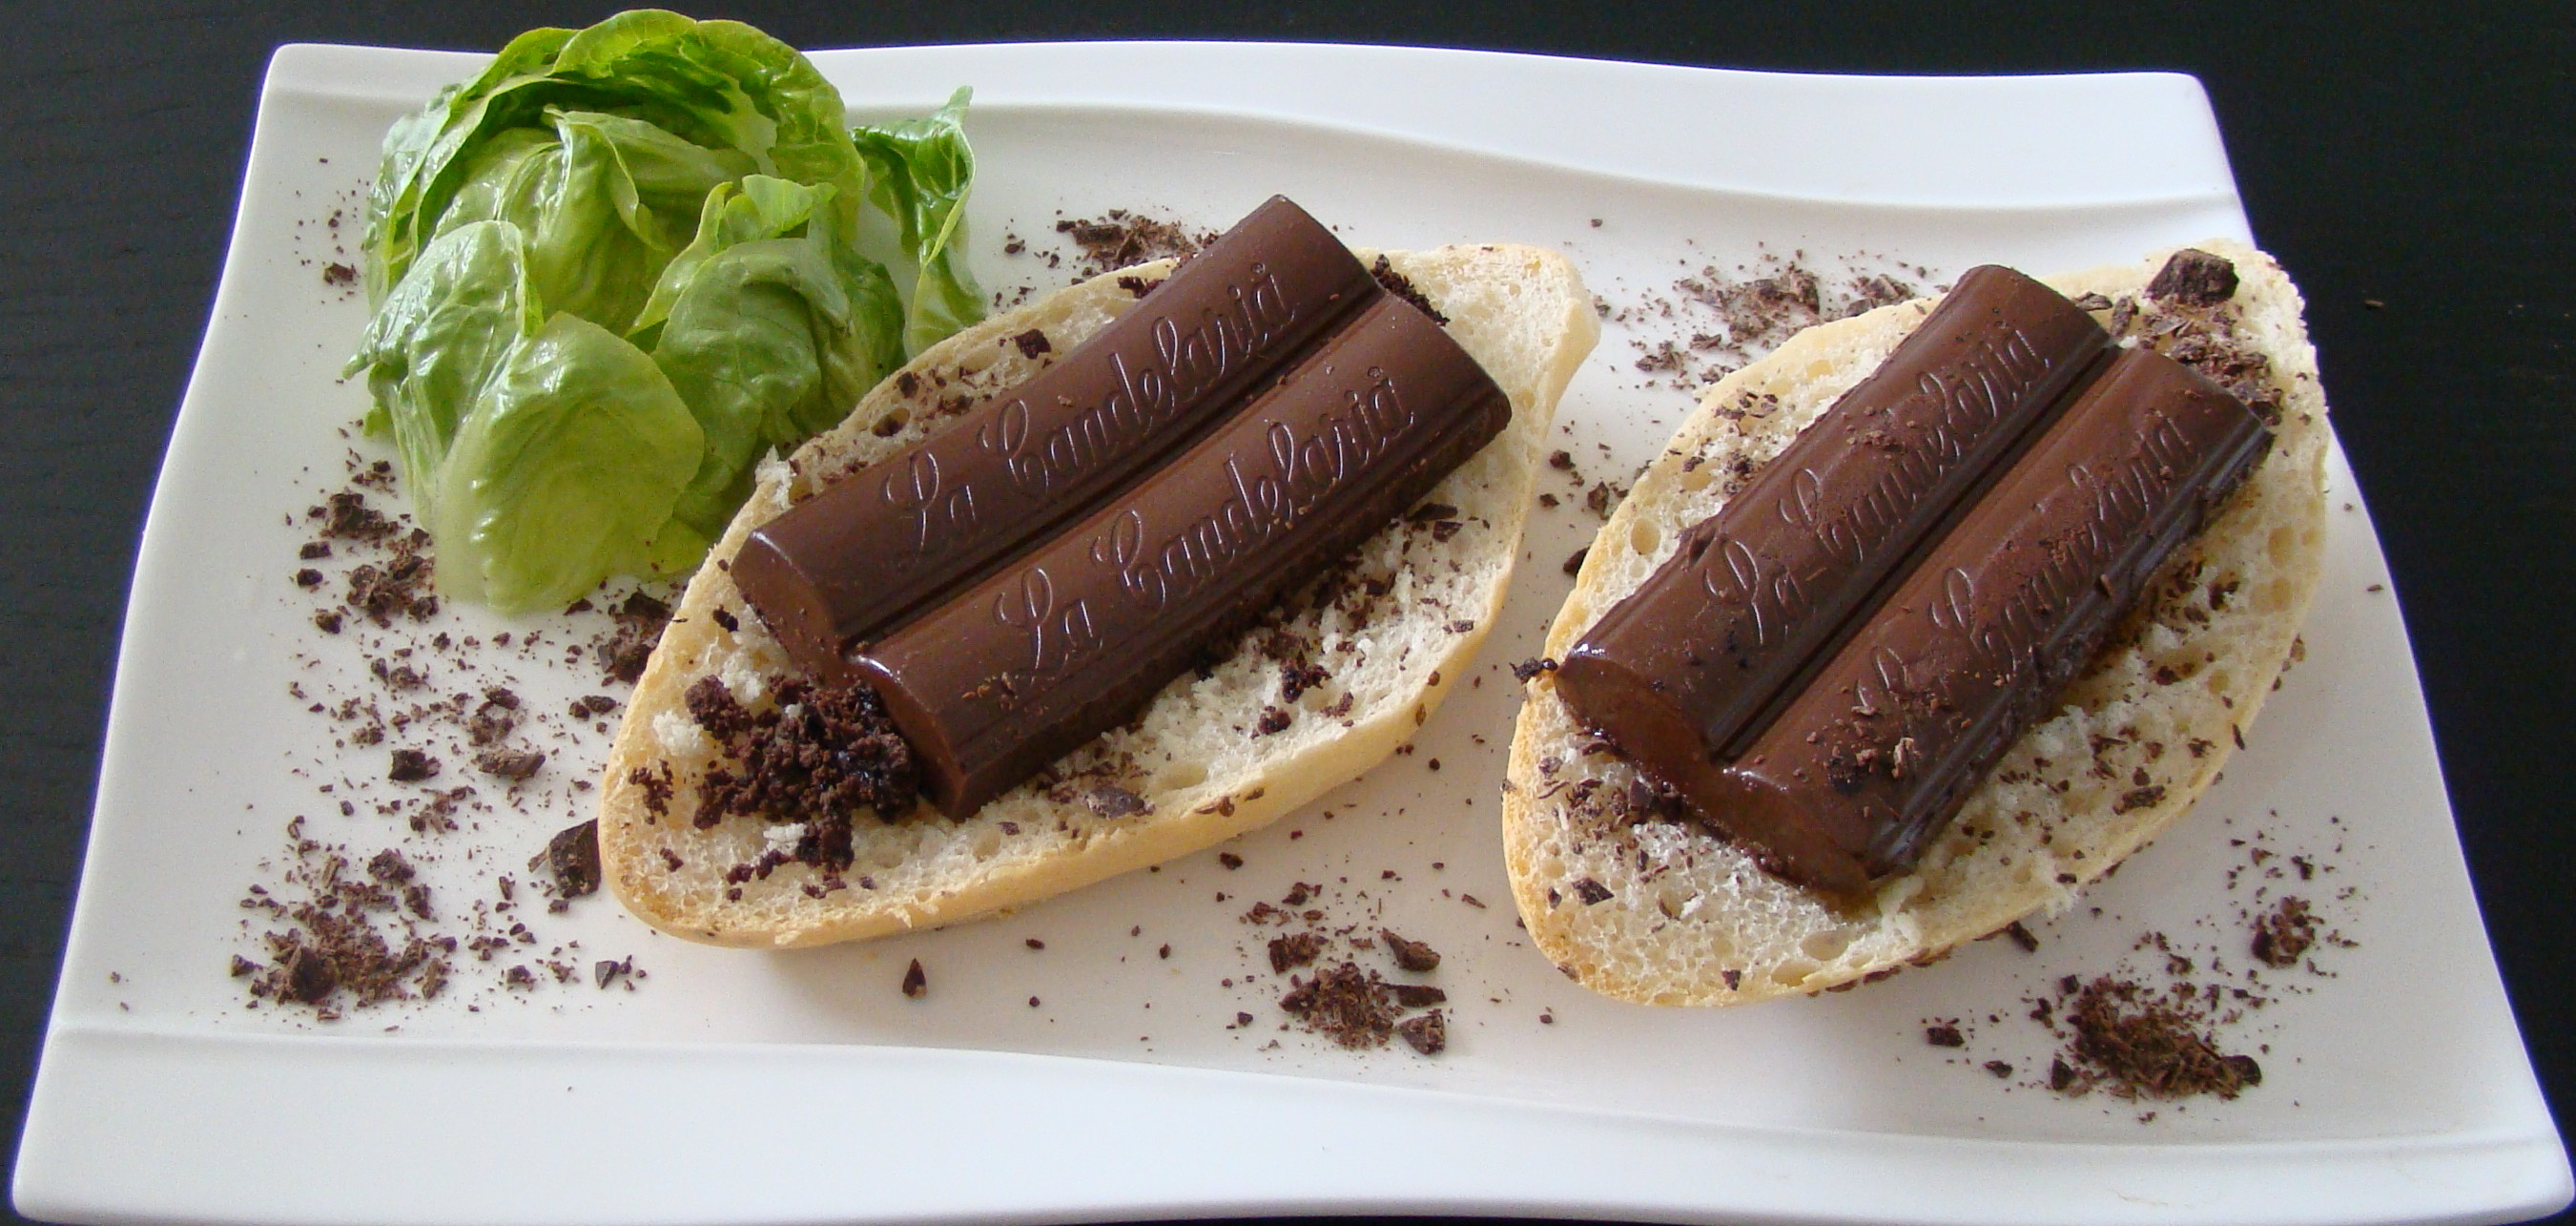 BOCADILLO DE CHOCOLATE